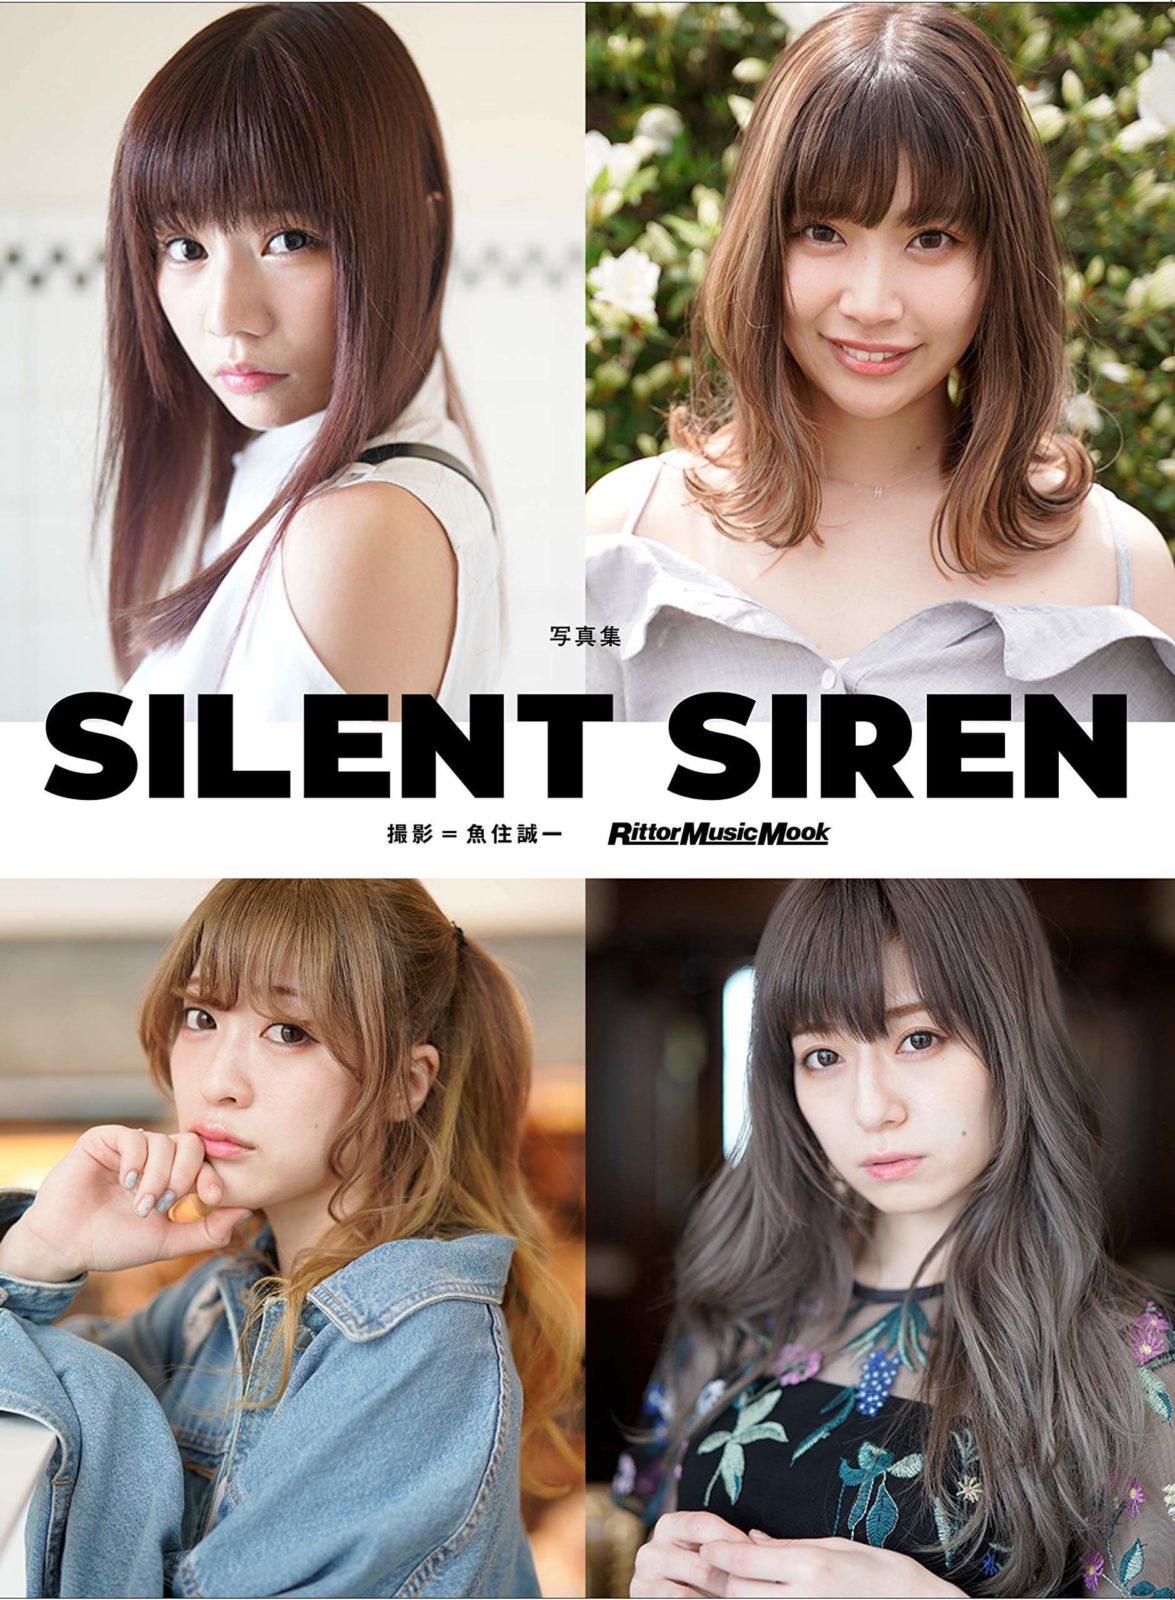 SILENT SIREN、初の公式写真集『写真集SILENT SIREN』が発売